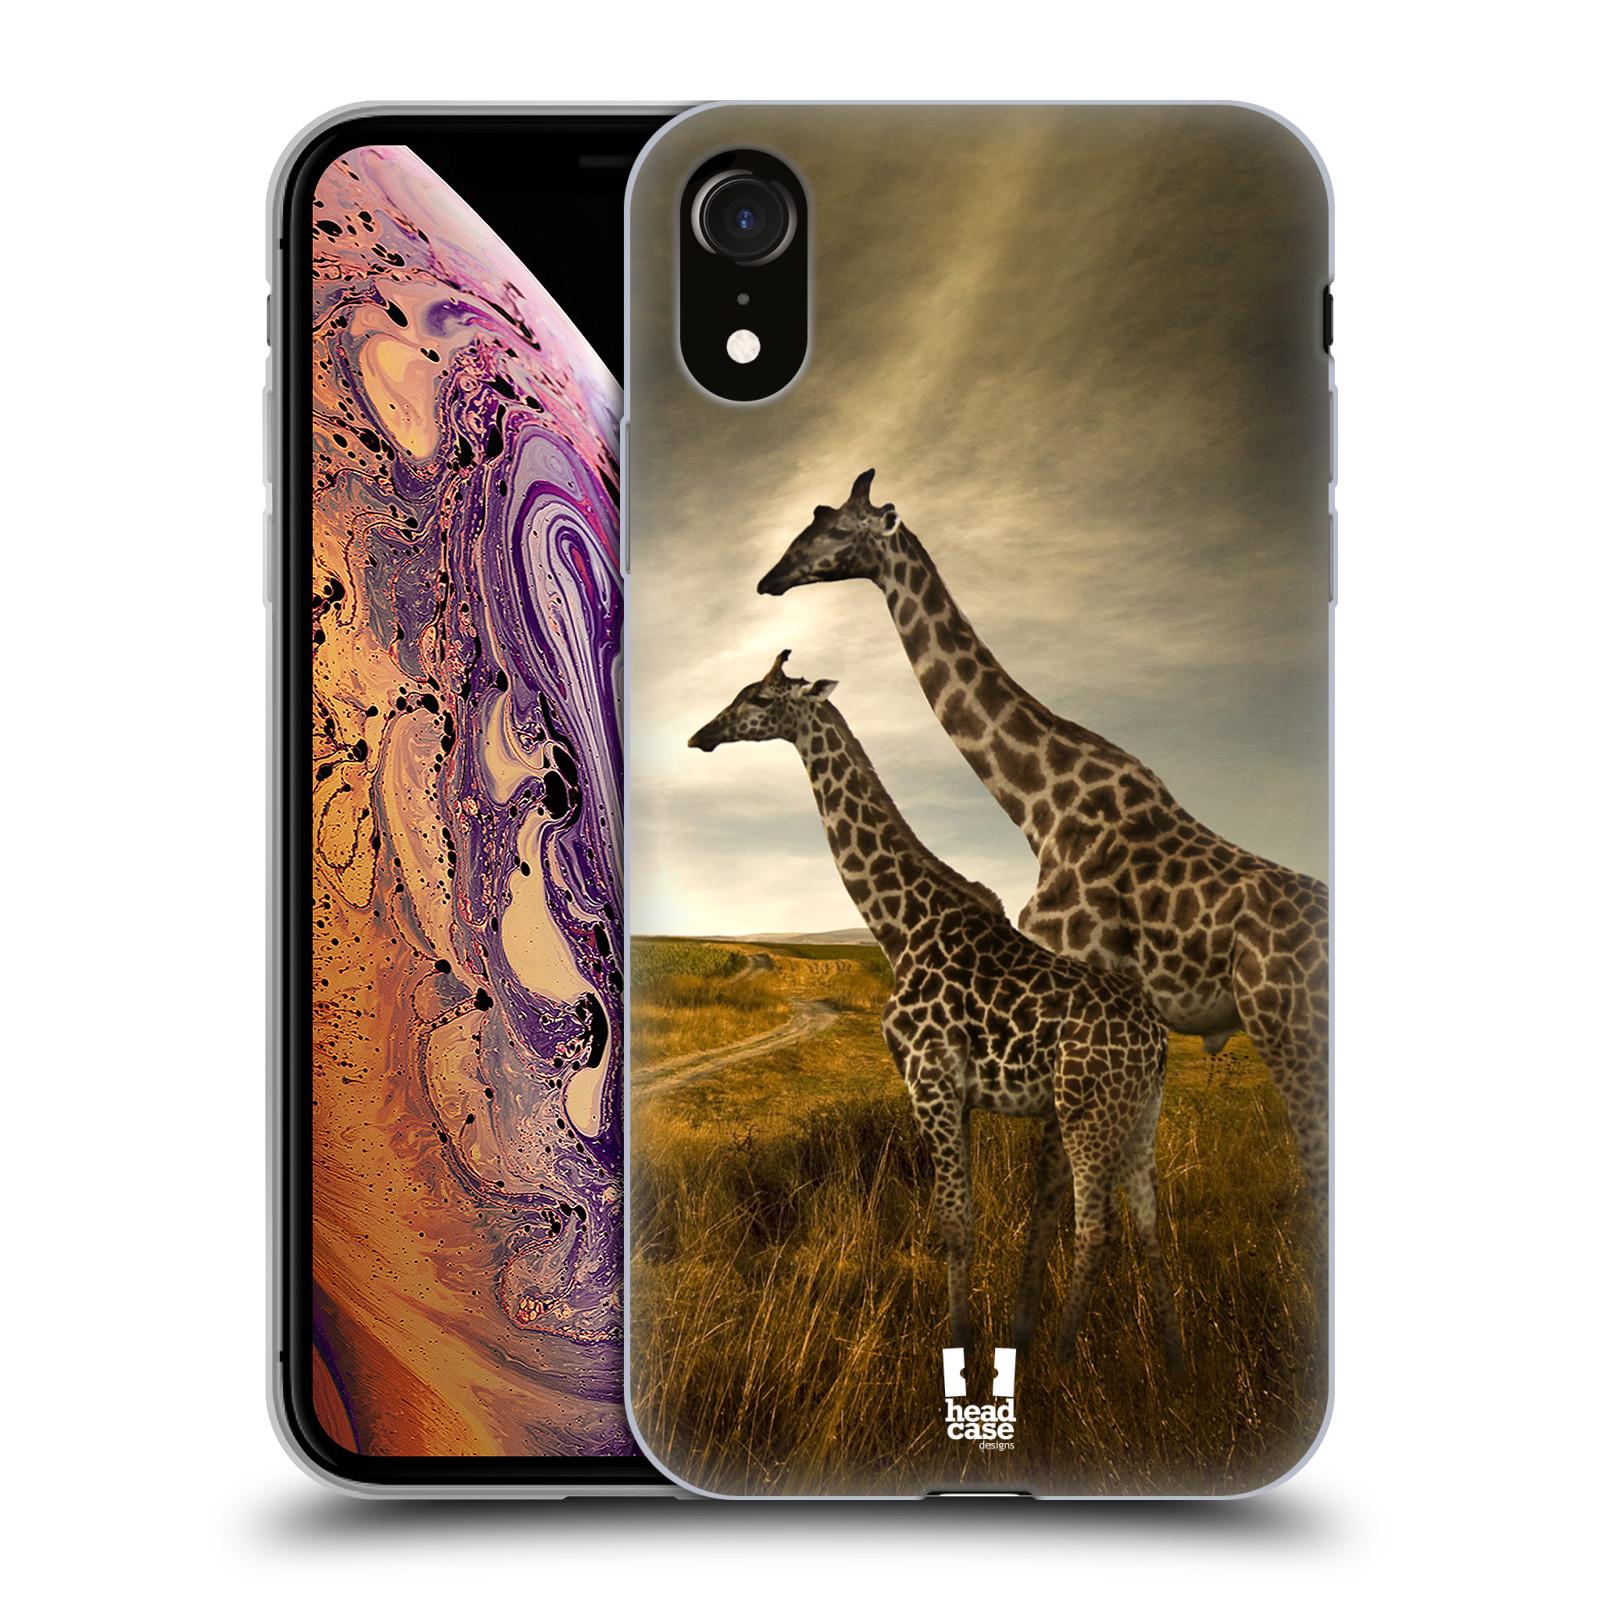 Silikonové pouzdro na mobil Apple iPhone XR - Head Case - DIVOČINA – ŽIRAFY